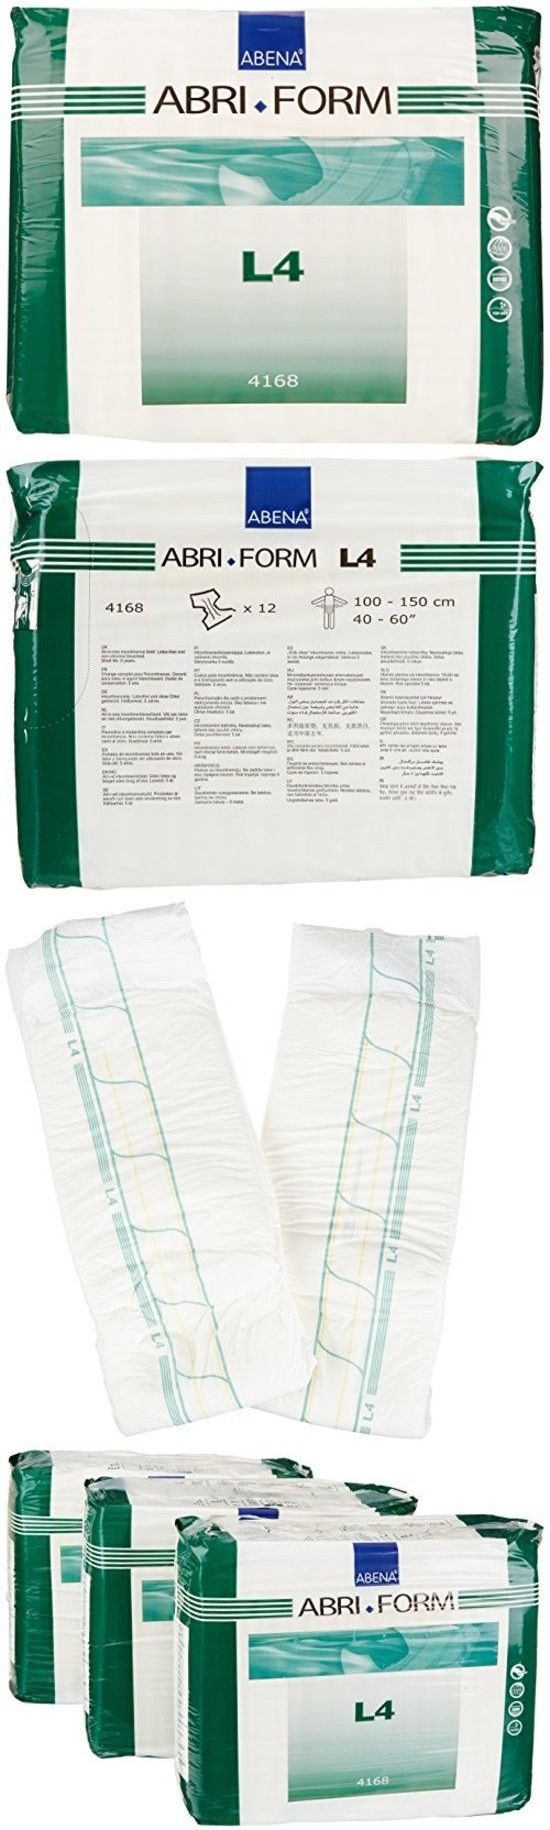 Abena Abri Form Comfort Briefs Large L4 36 Count 3 Packs Of 14